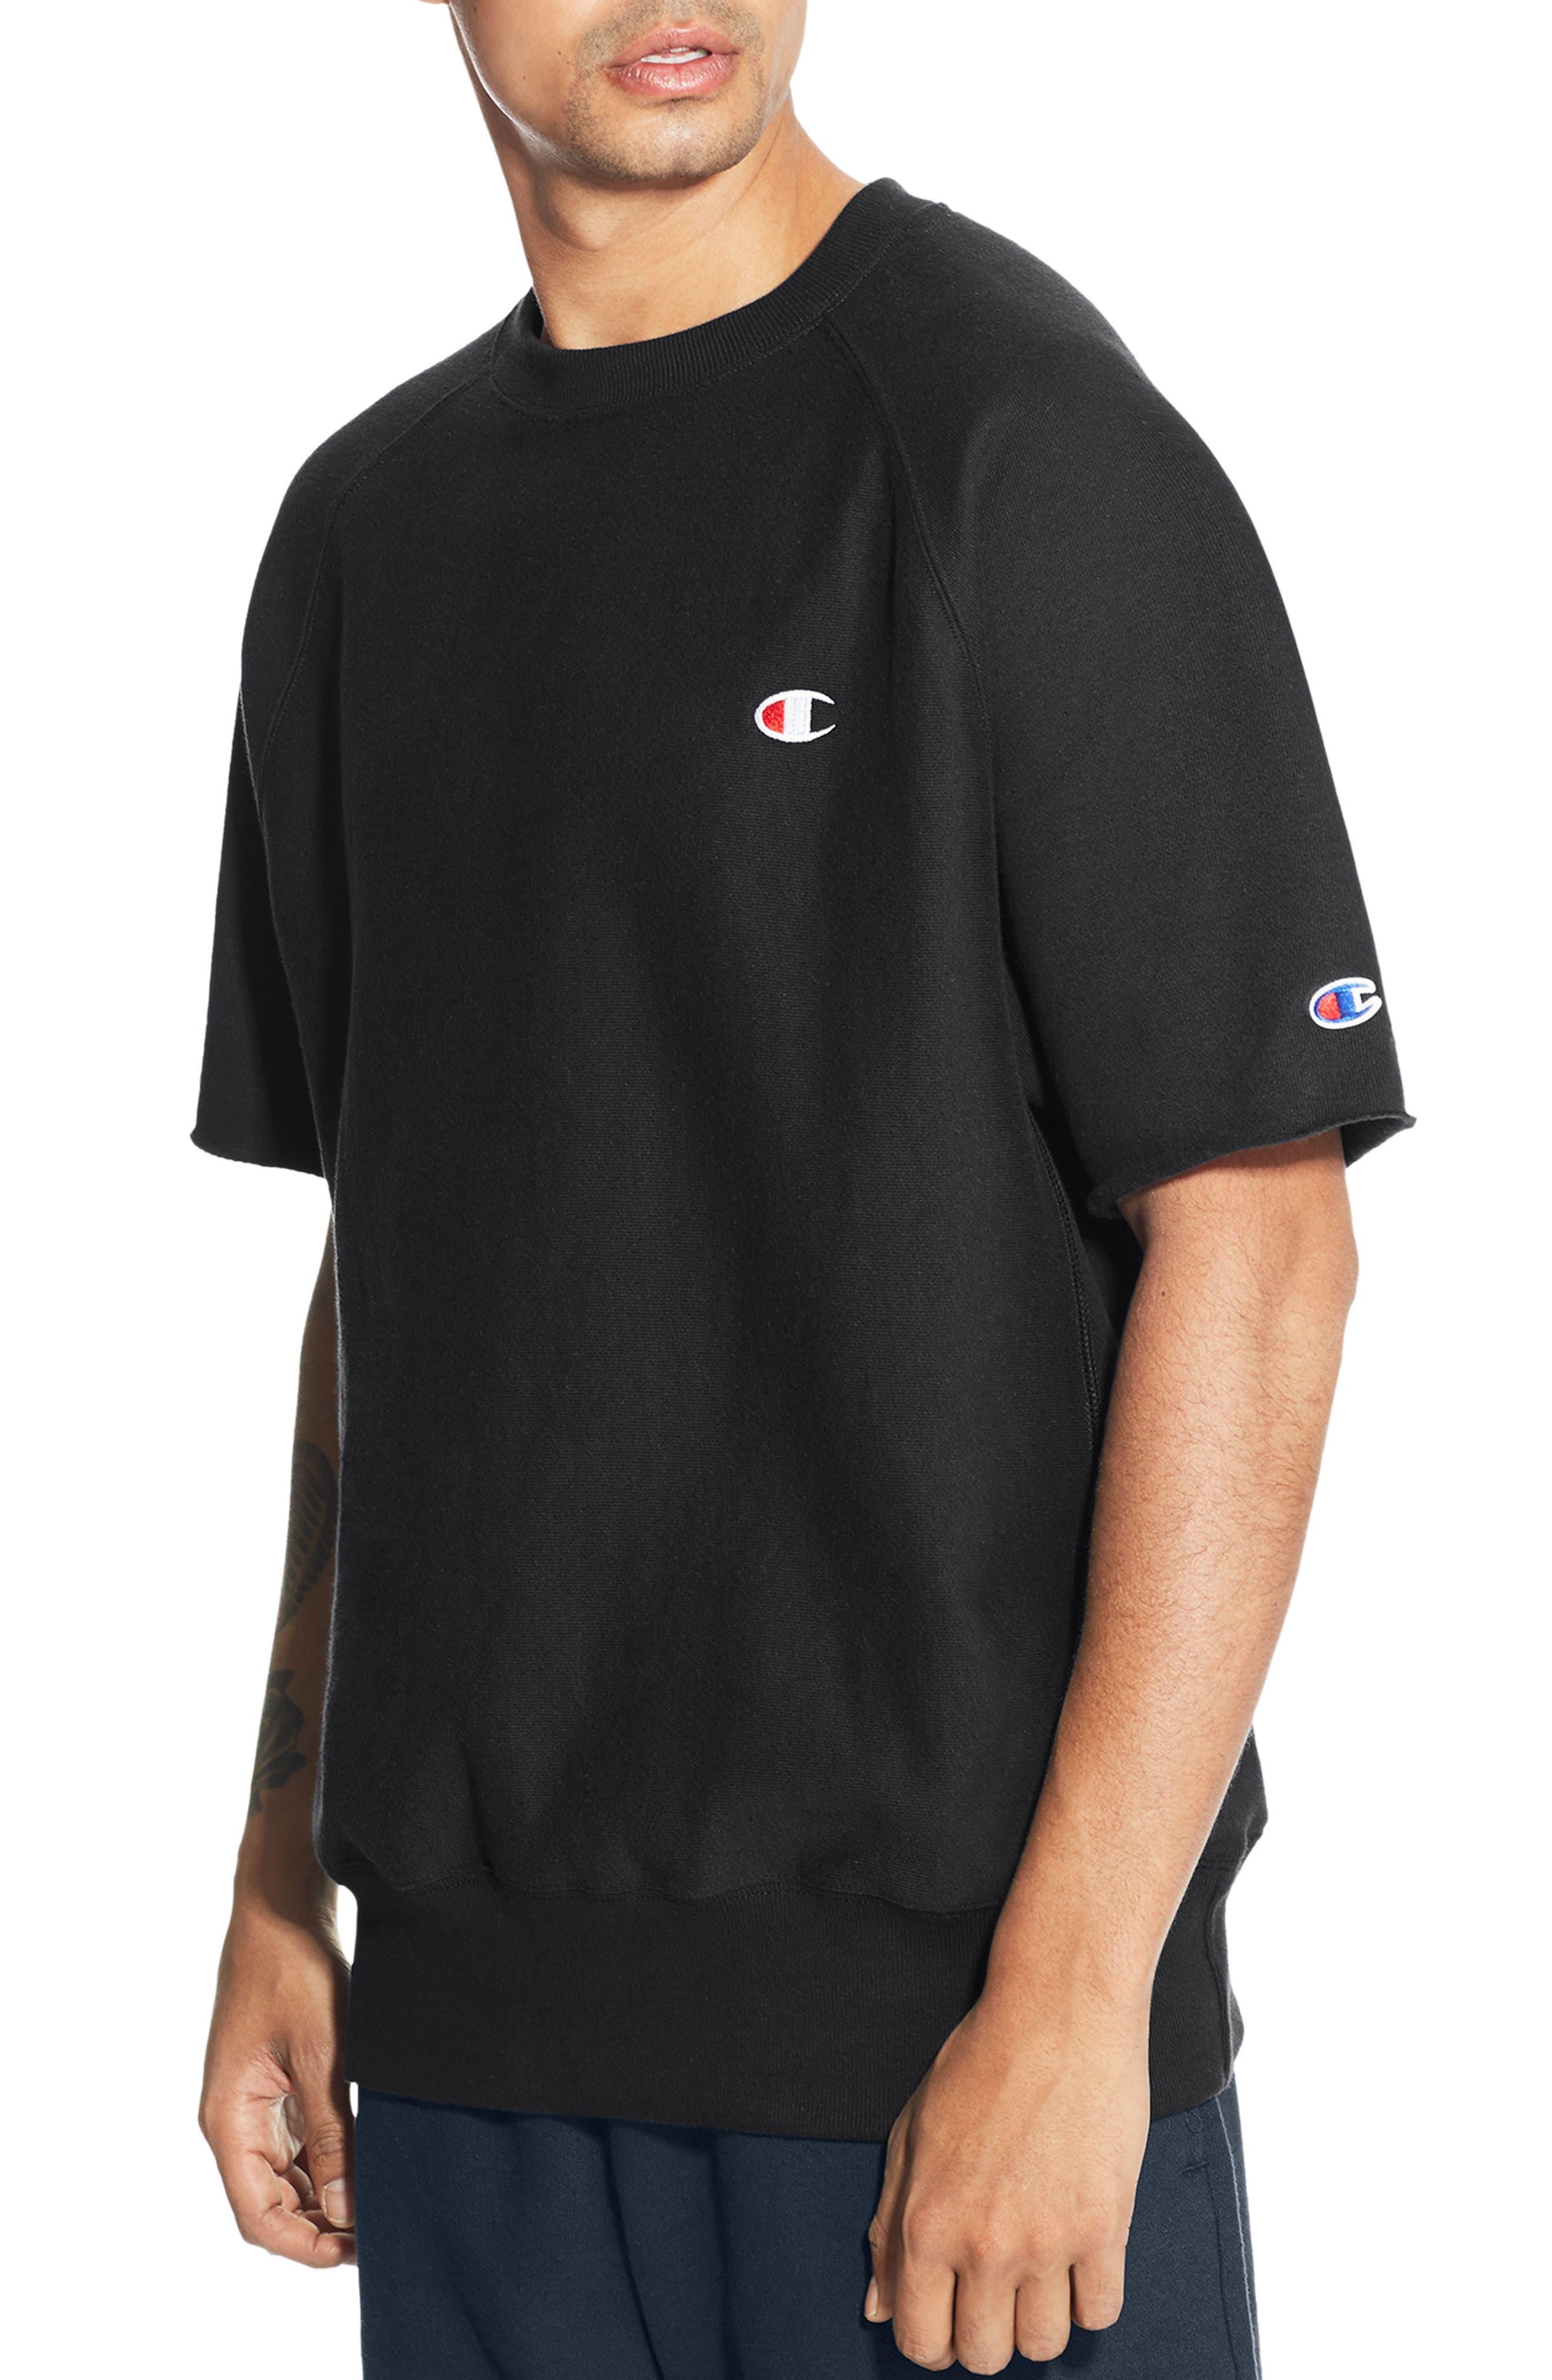 CHAMPION Reverse Weave Short Sleeve Sweatshirt, Main, color, 001